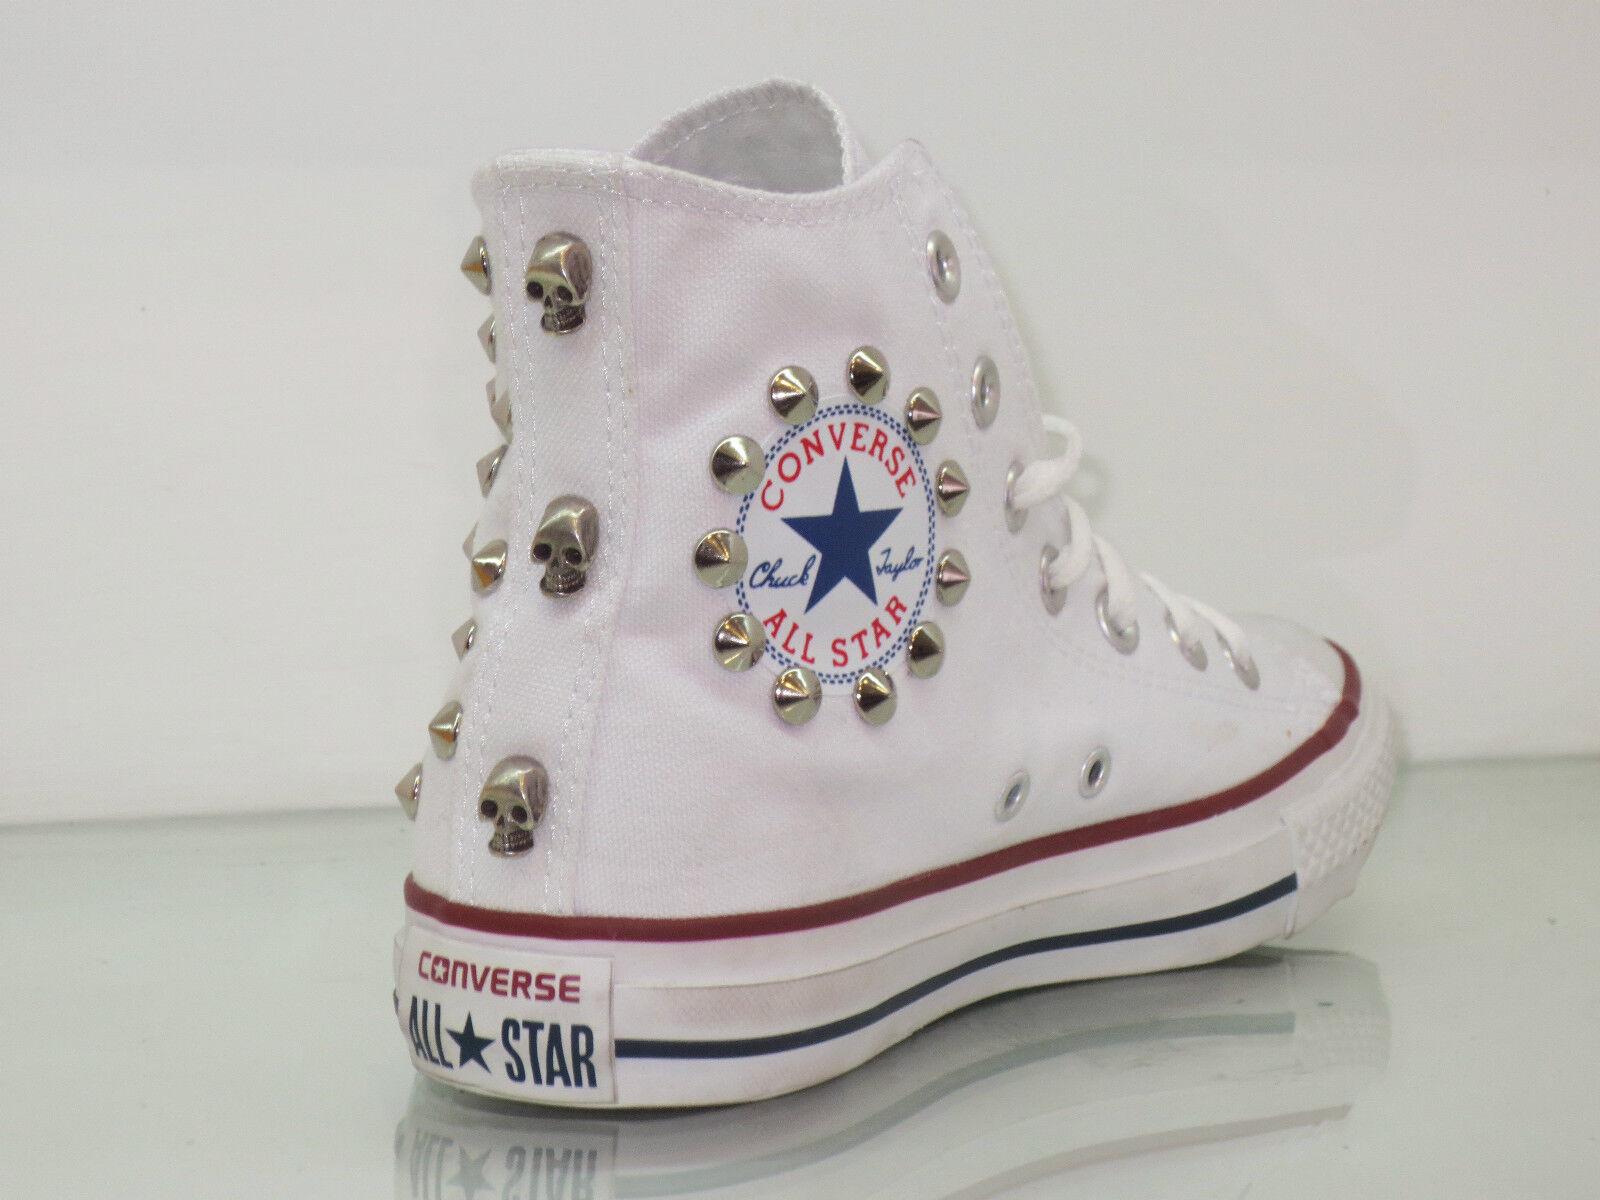 Converse all star Hi borch-ie e tesch-i scarpe donna uomo Bianco artigianali